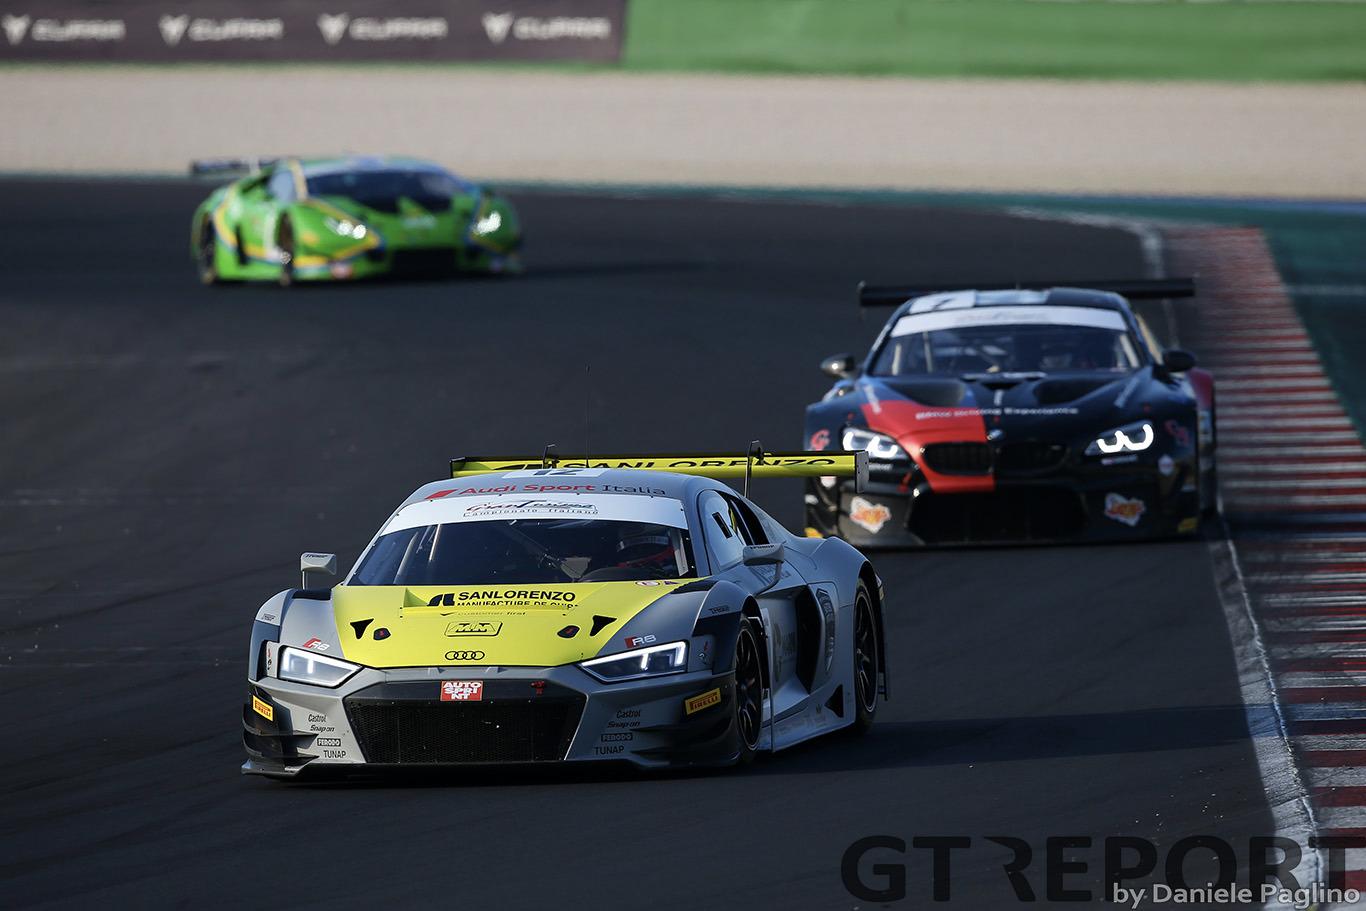 Italian GT Misano: Agostini, Mancinelli take Race 1 honors for Audi Sport Italia